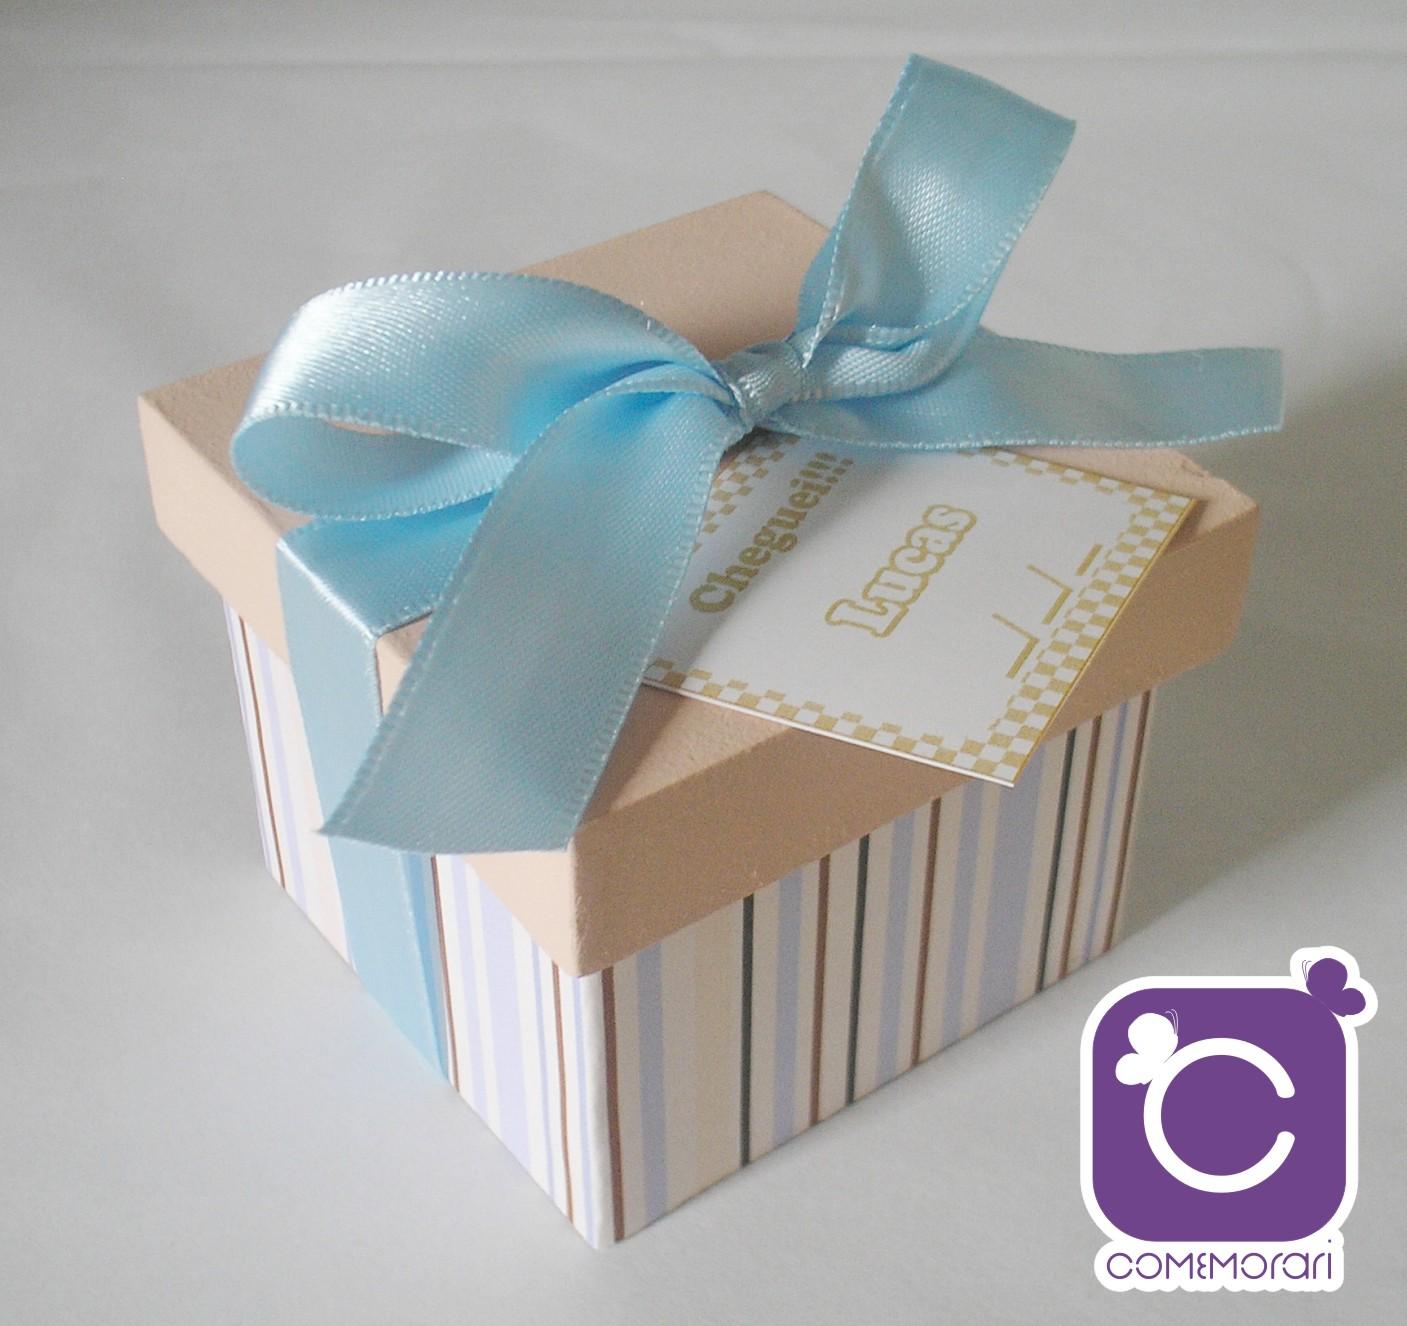 boxes souvenir gifts mdf forward m32 caixinha mdf forrada jpg 1407 #357D96 1407x1326